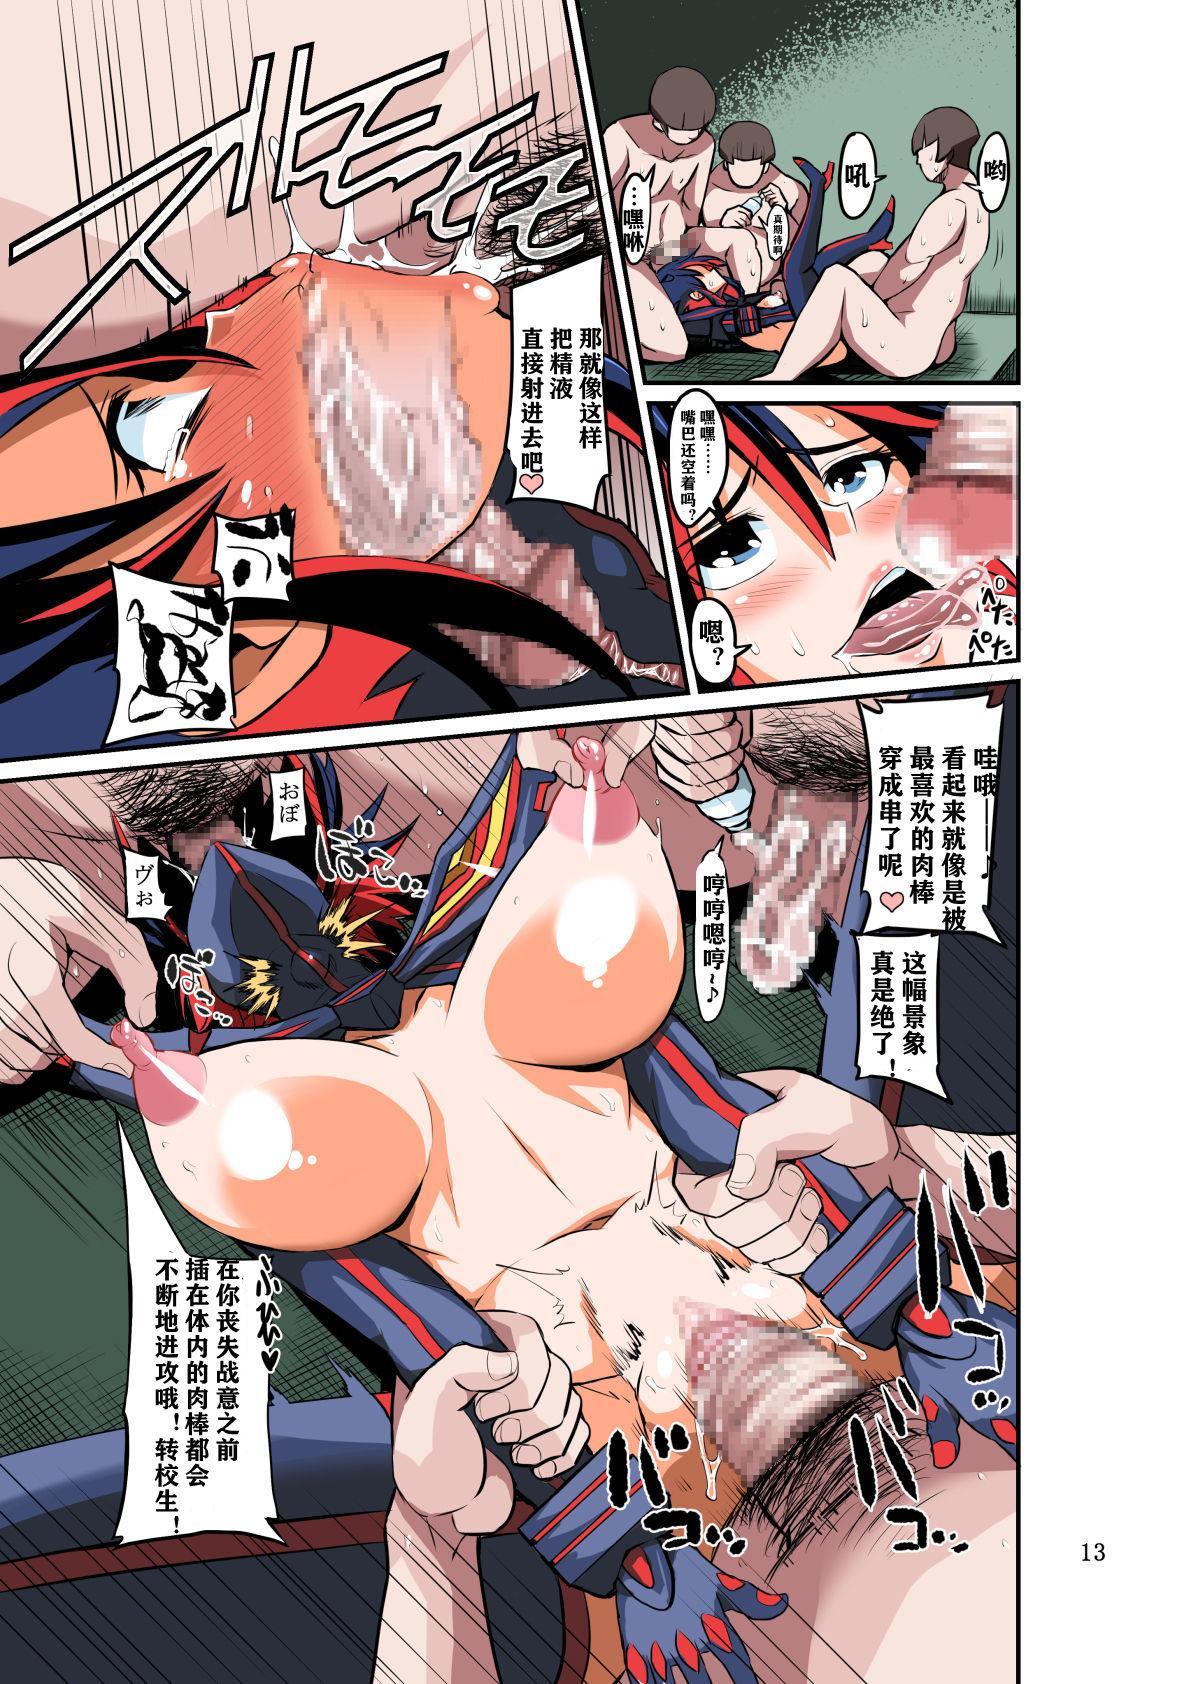 [GOD Ryokutya (Bu-chan)] Junnou [Color Ban] (Kill la Kill) [Digital][chinese]【云月长空个人汉化】 13